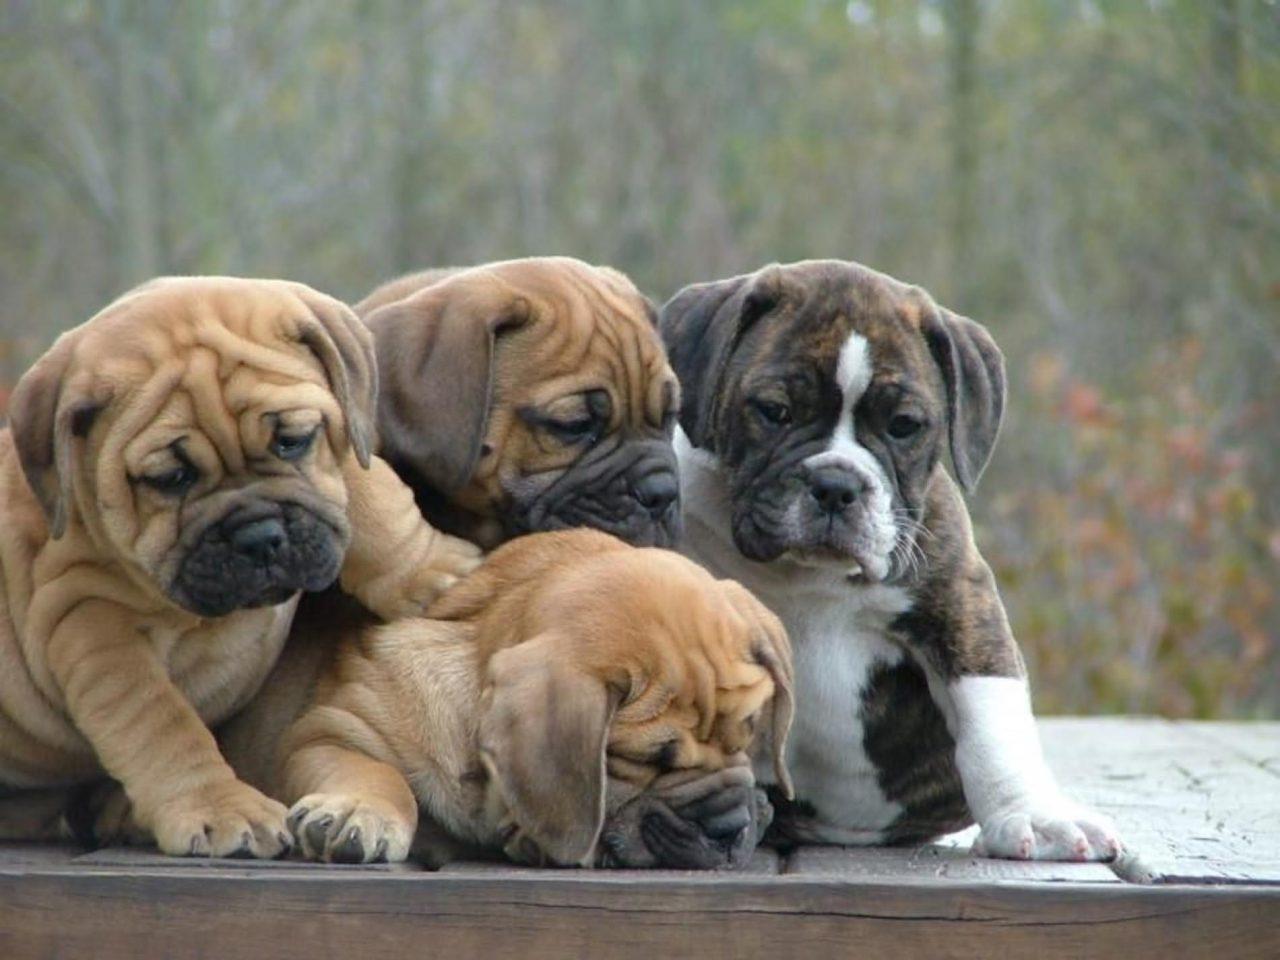 Beautiful-Bulldog-Puppies-Playing